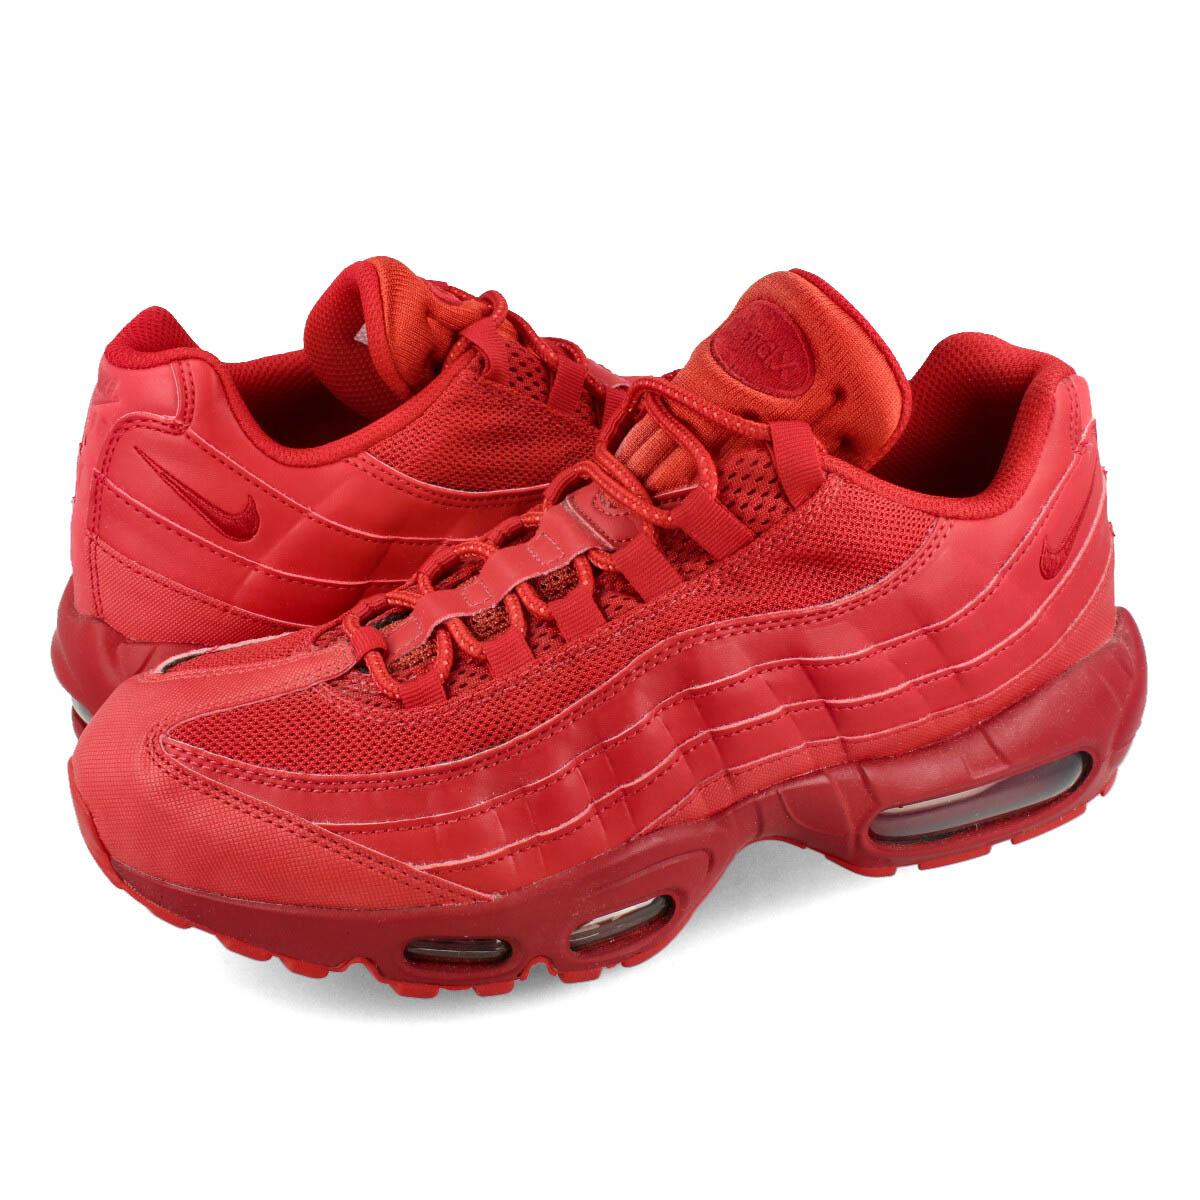 NIKE AIR MAX 95 ナイキ エア マックス 95 VARSITY RED/VARSITY RED cq9969-600